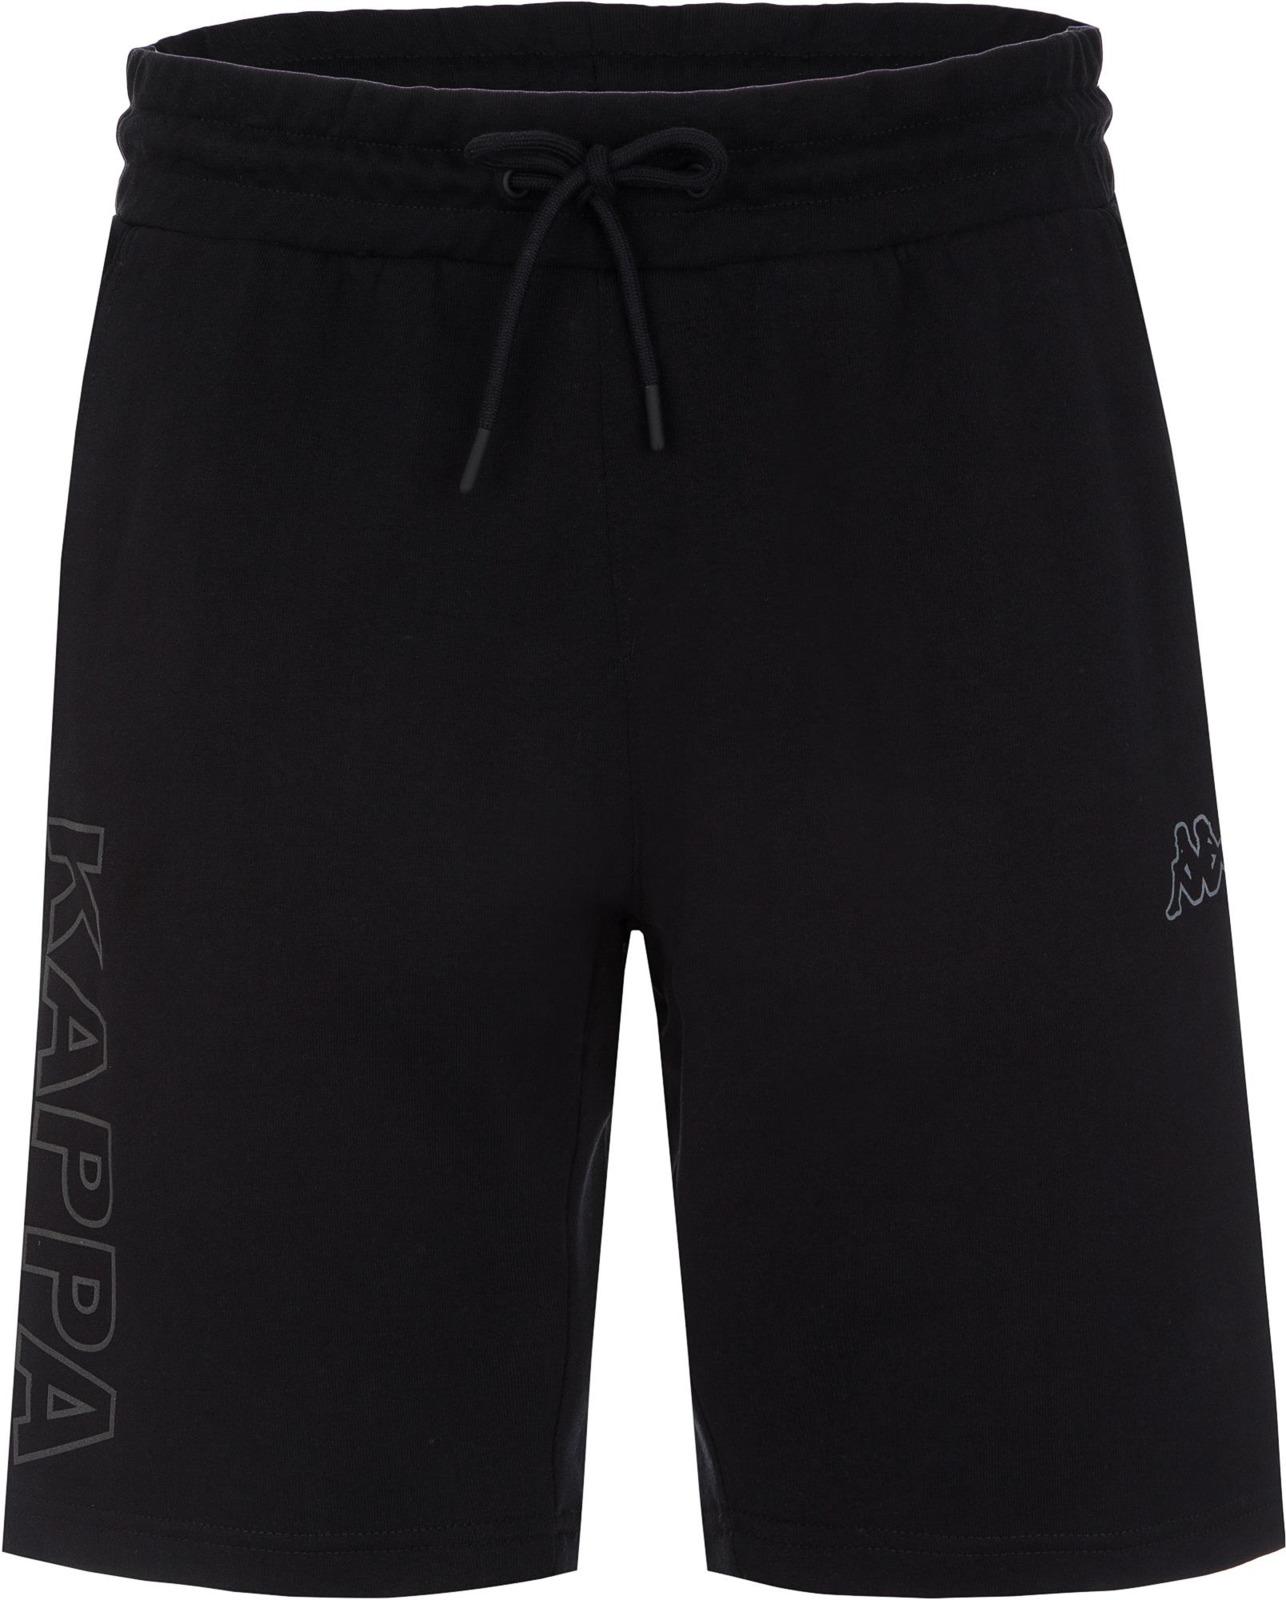 Шорты Kappa шорты для девочки kappa цвет темно серый 3032ne0 4a размер 140